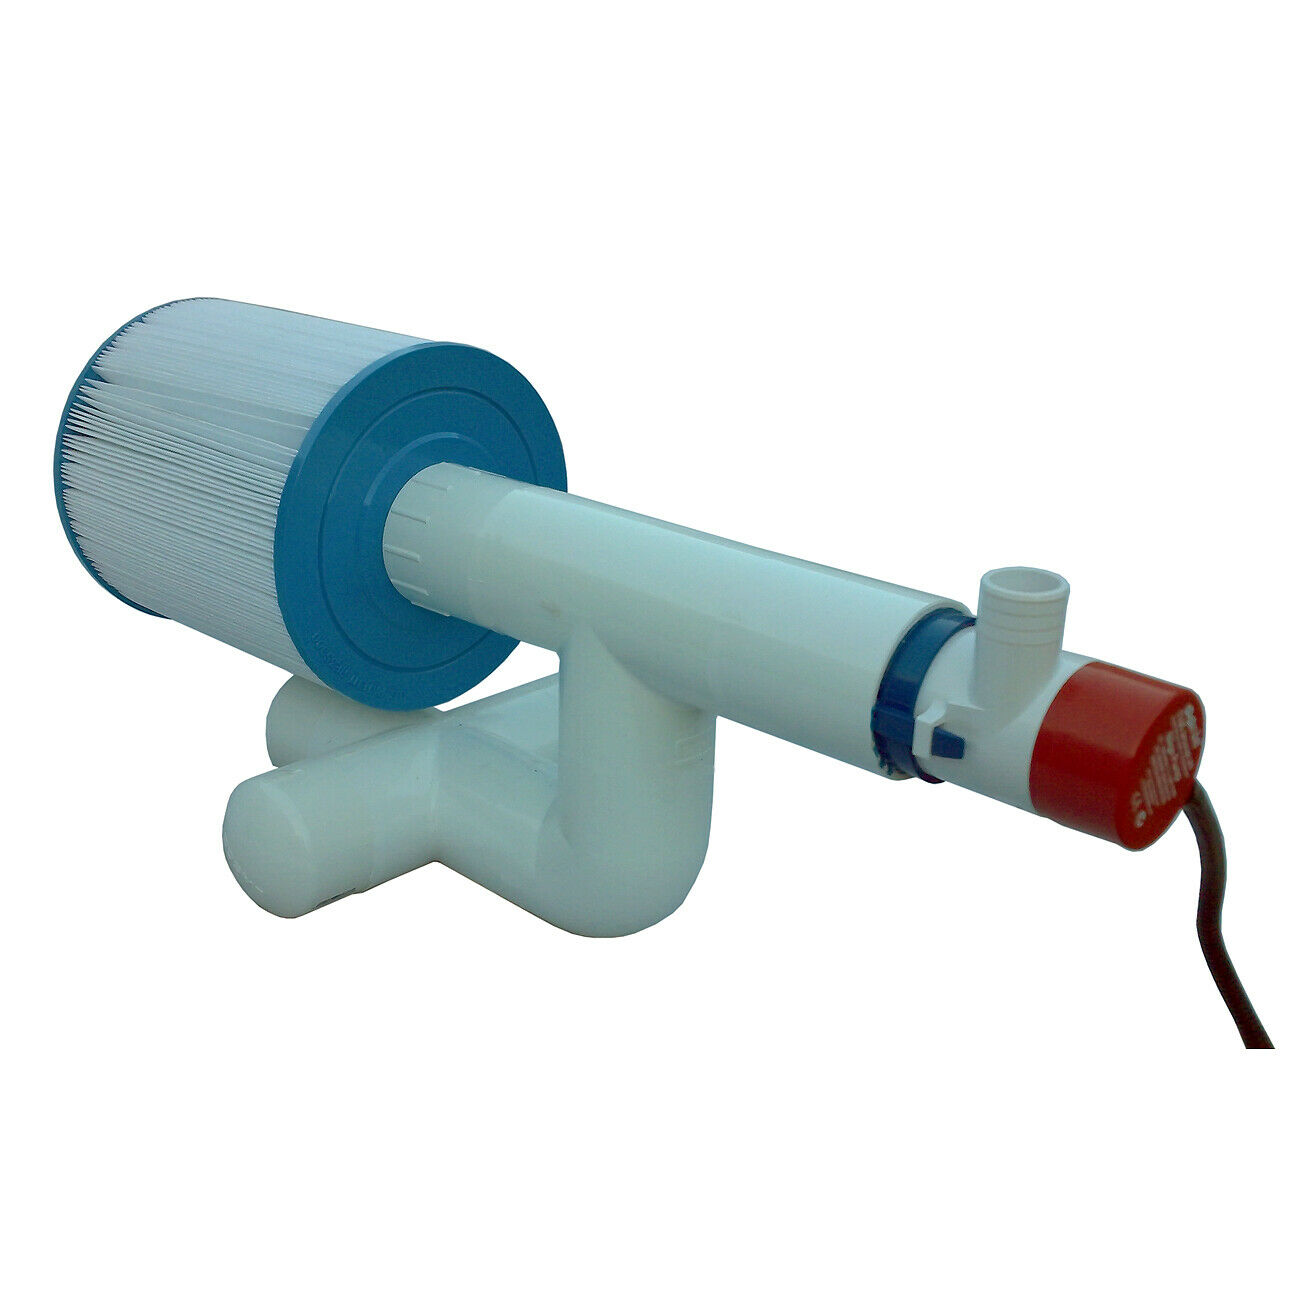 Bottom Feeder Solar Pool Filter Pump System 1100 Gph 6k